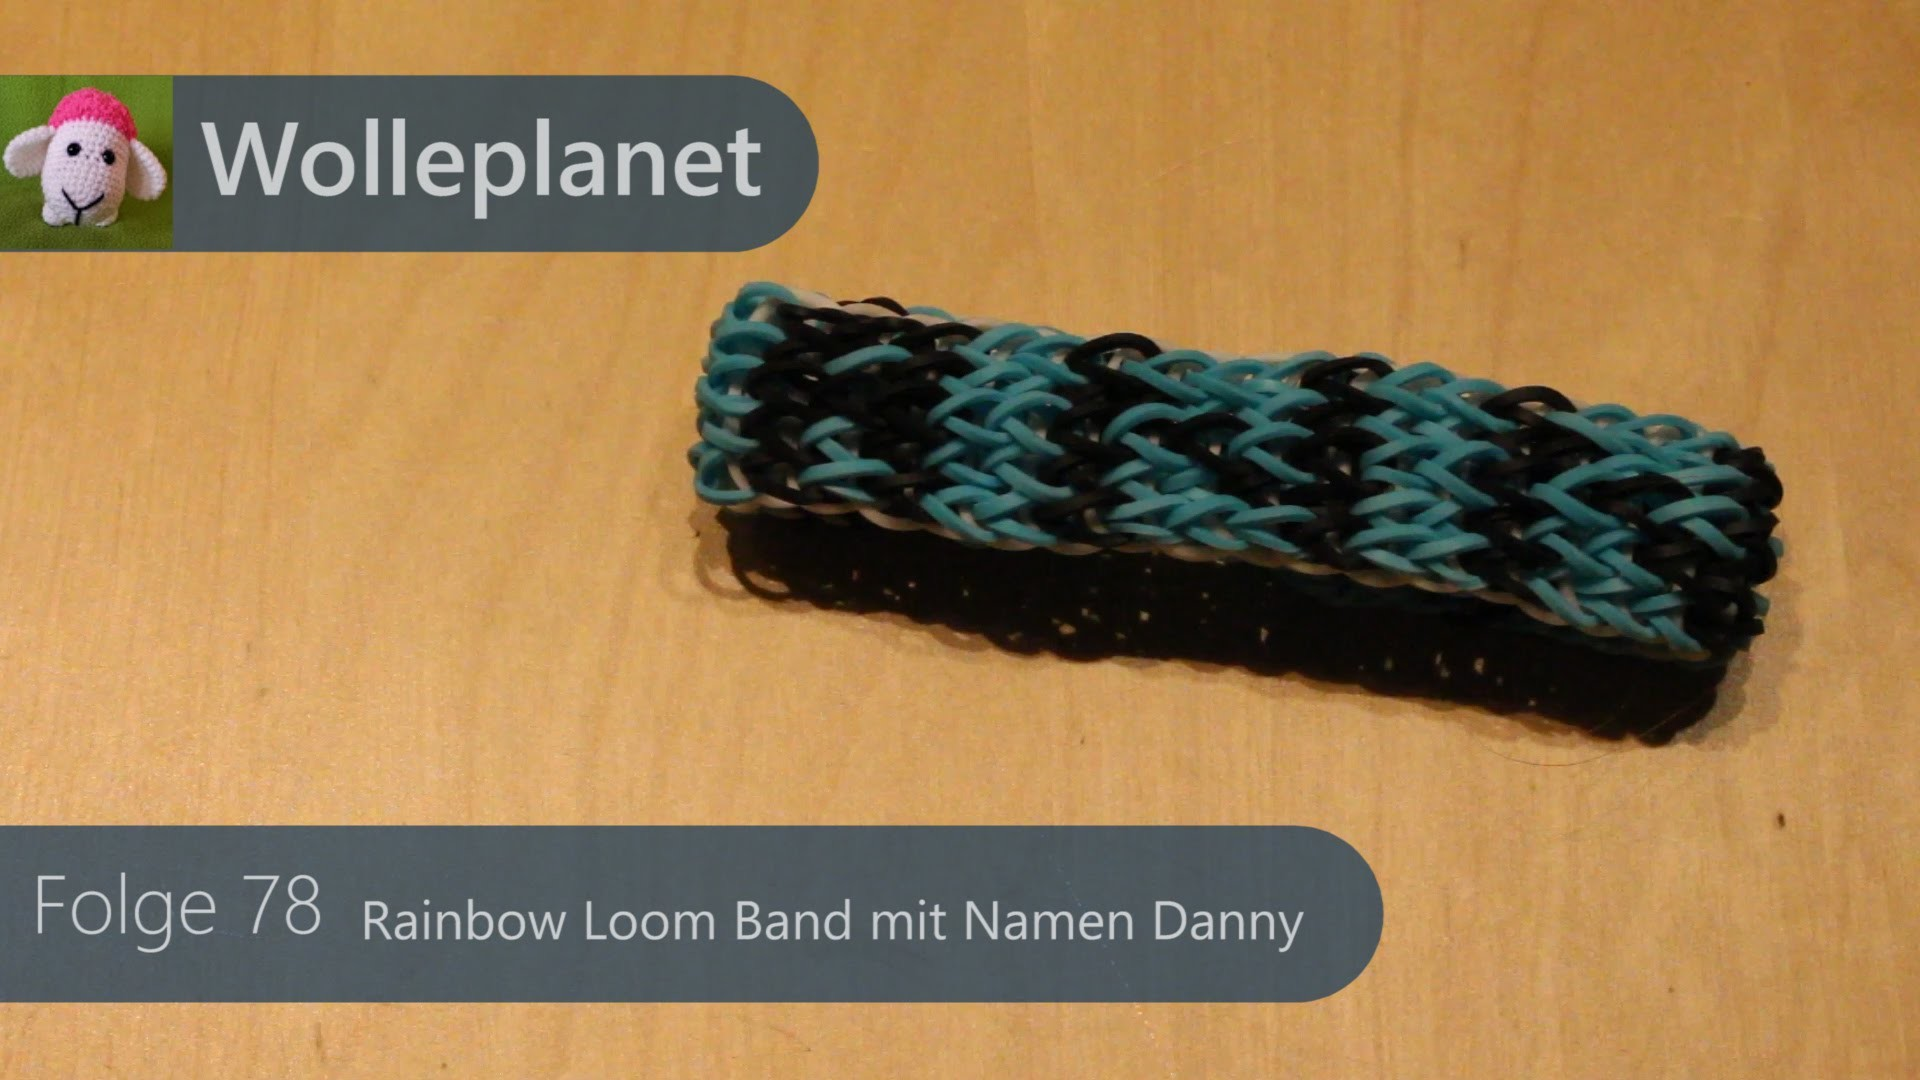 Rainbow Loom Band mit Namen Danny mit Loom